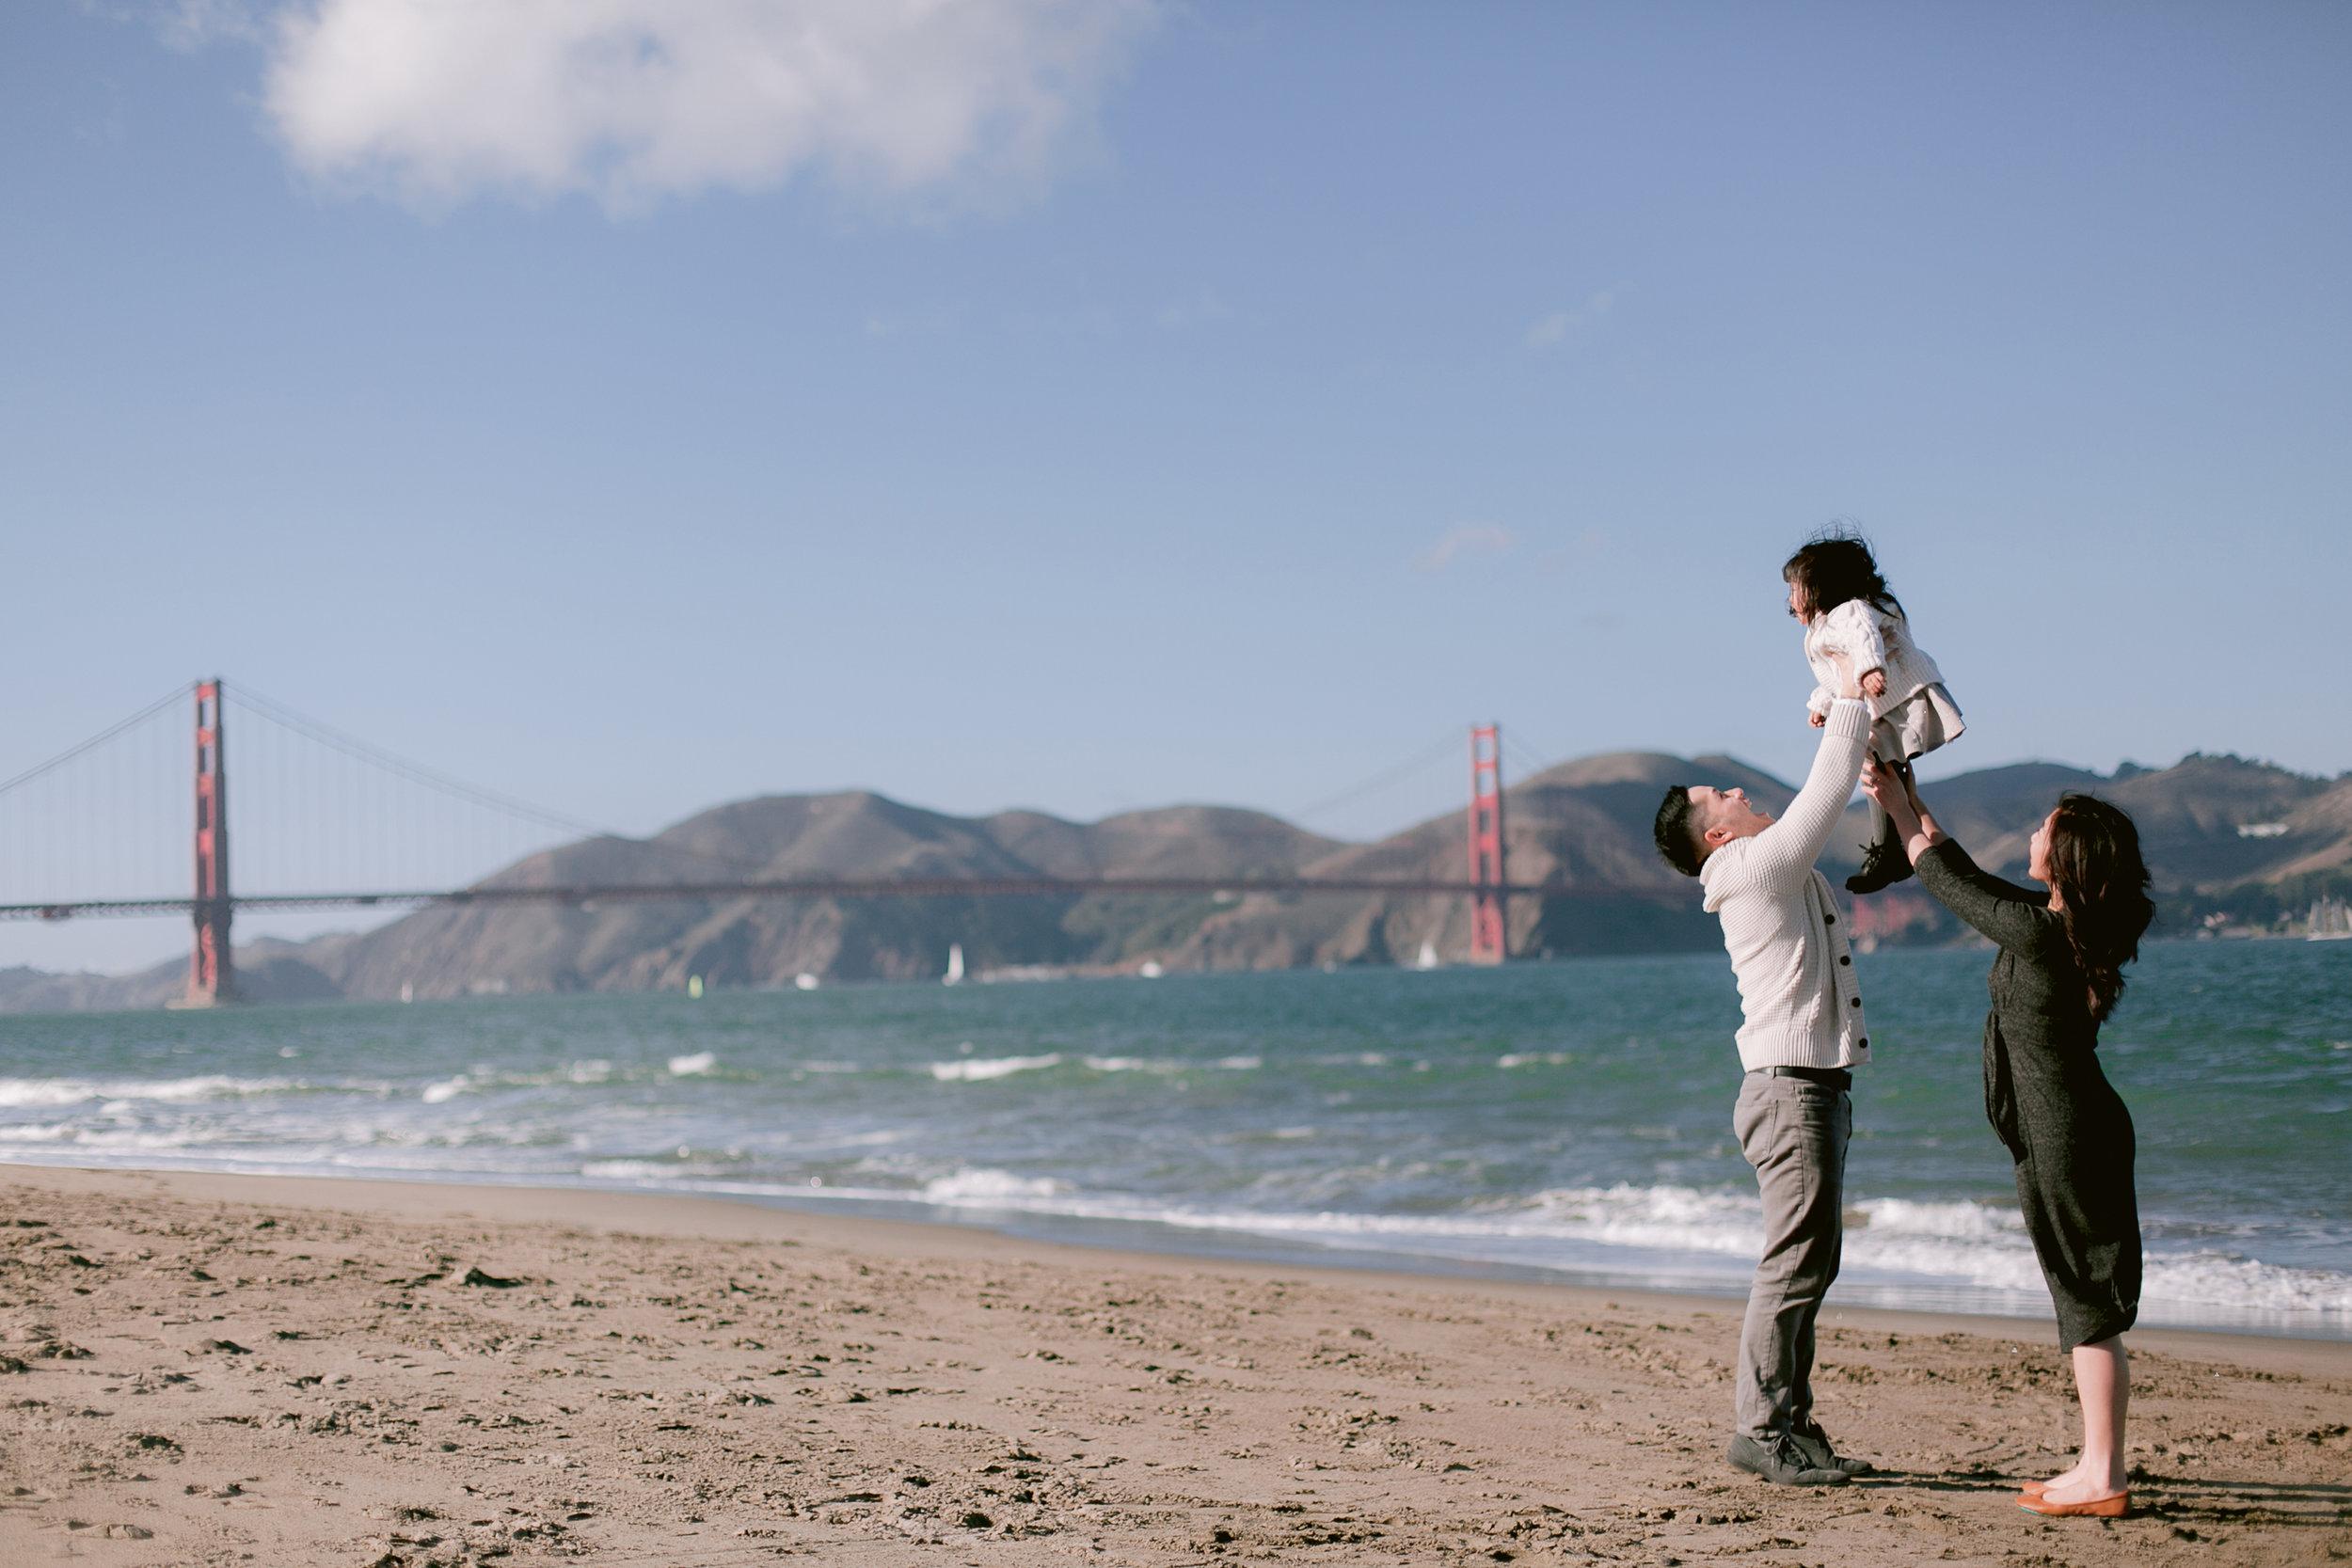 San_Francisco_Children_and_Family_Portrait_009.jpg